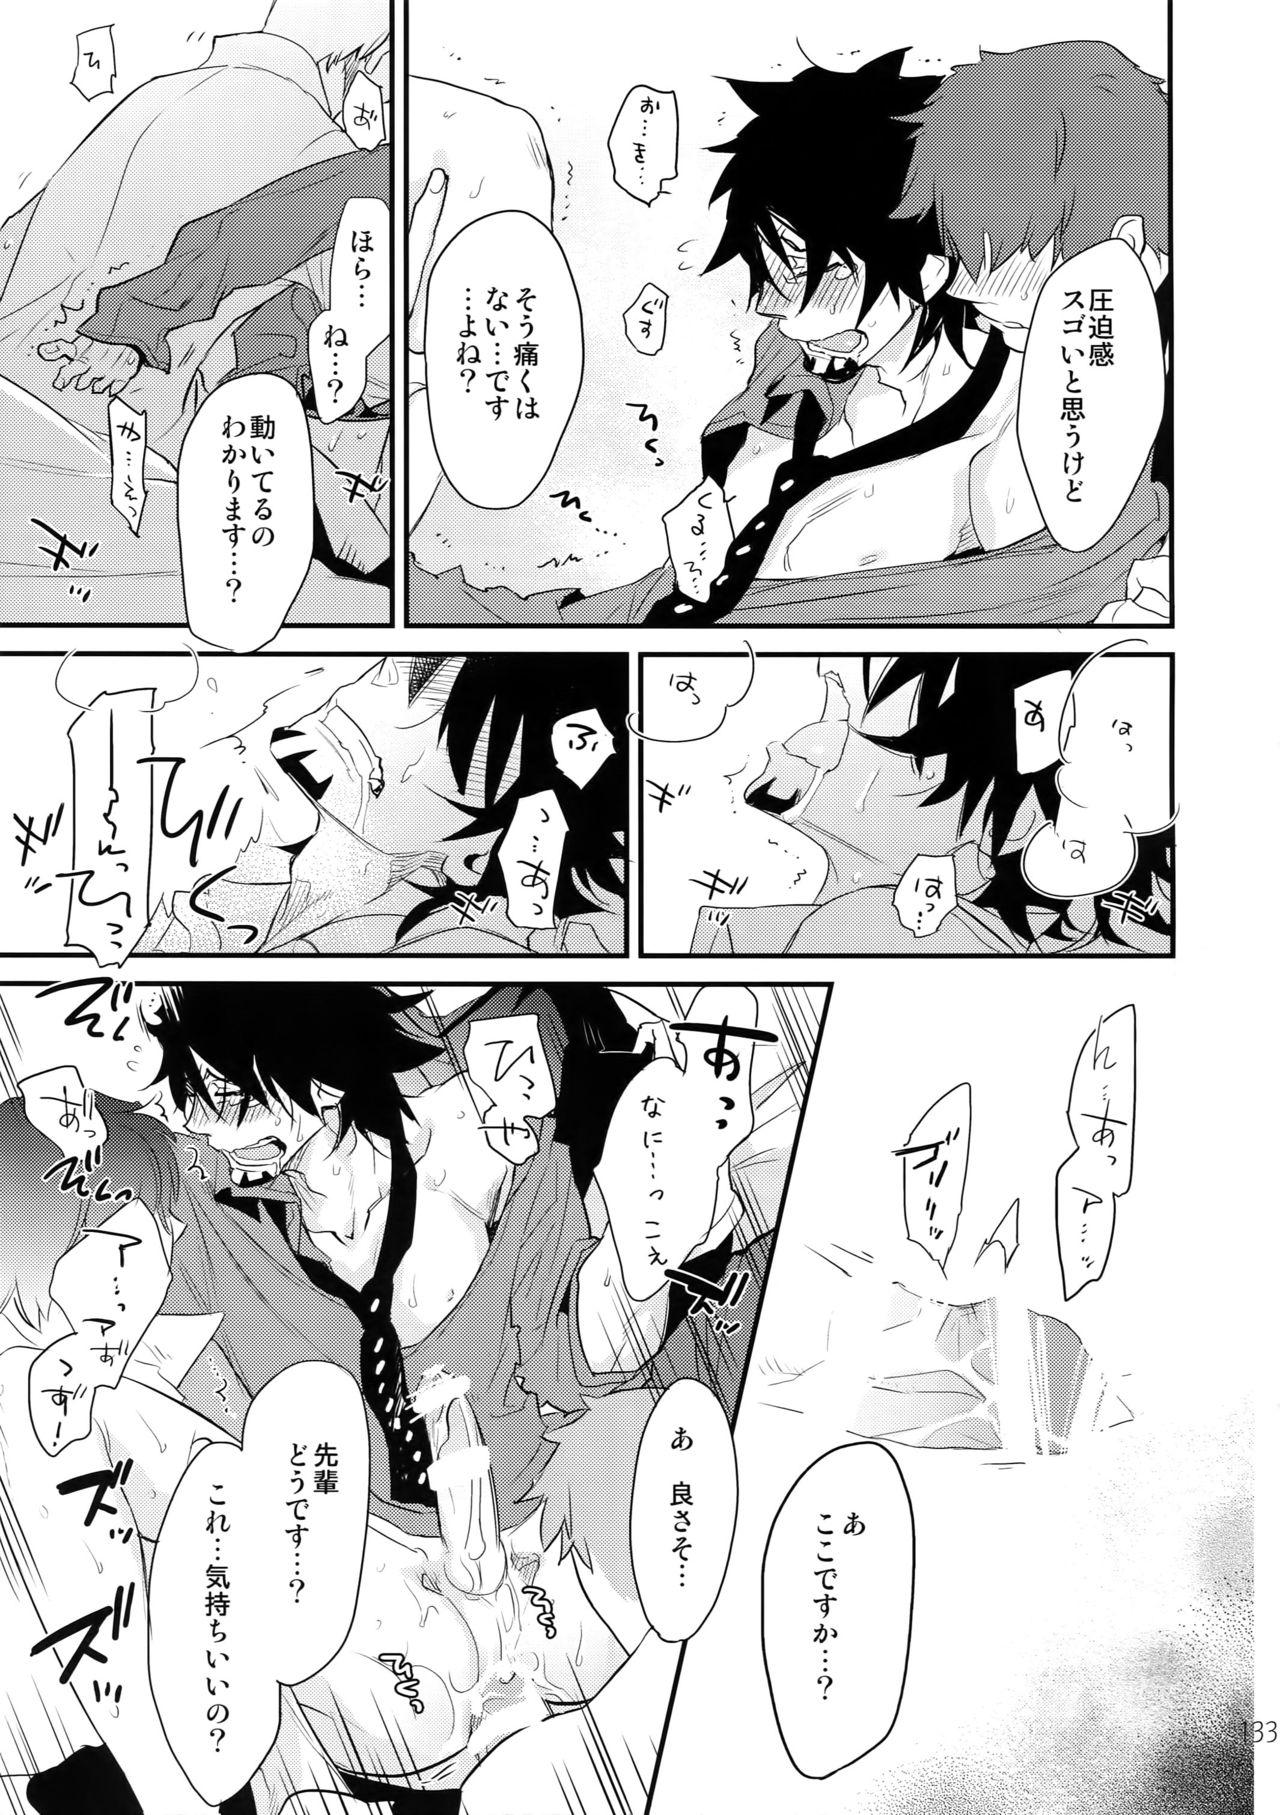 T&B Sairoku! 2 131